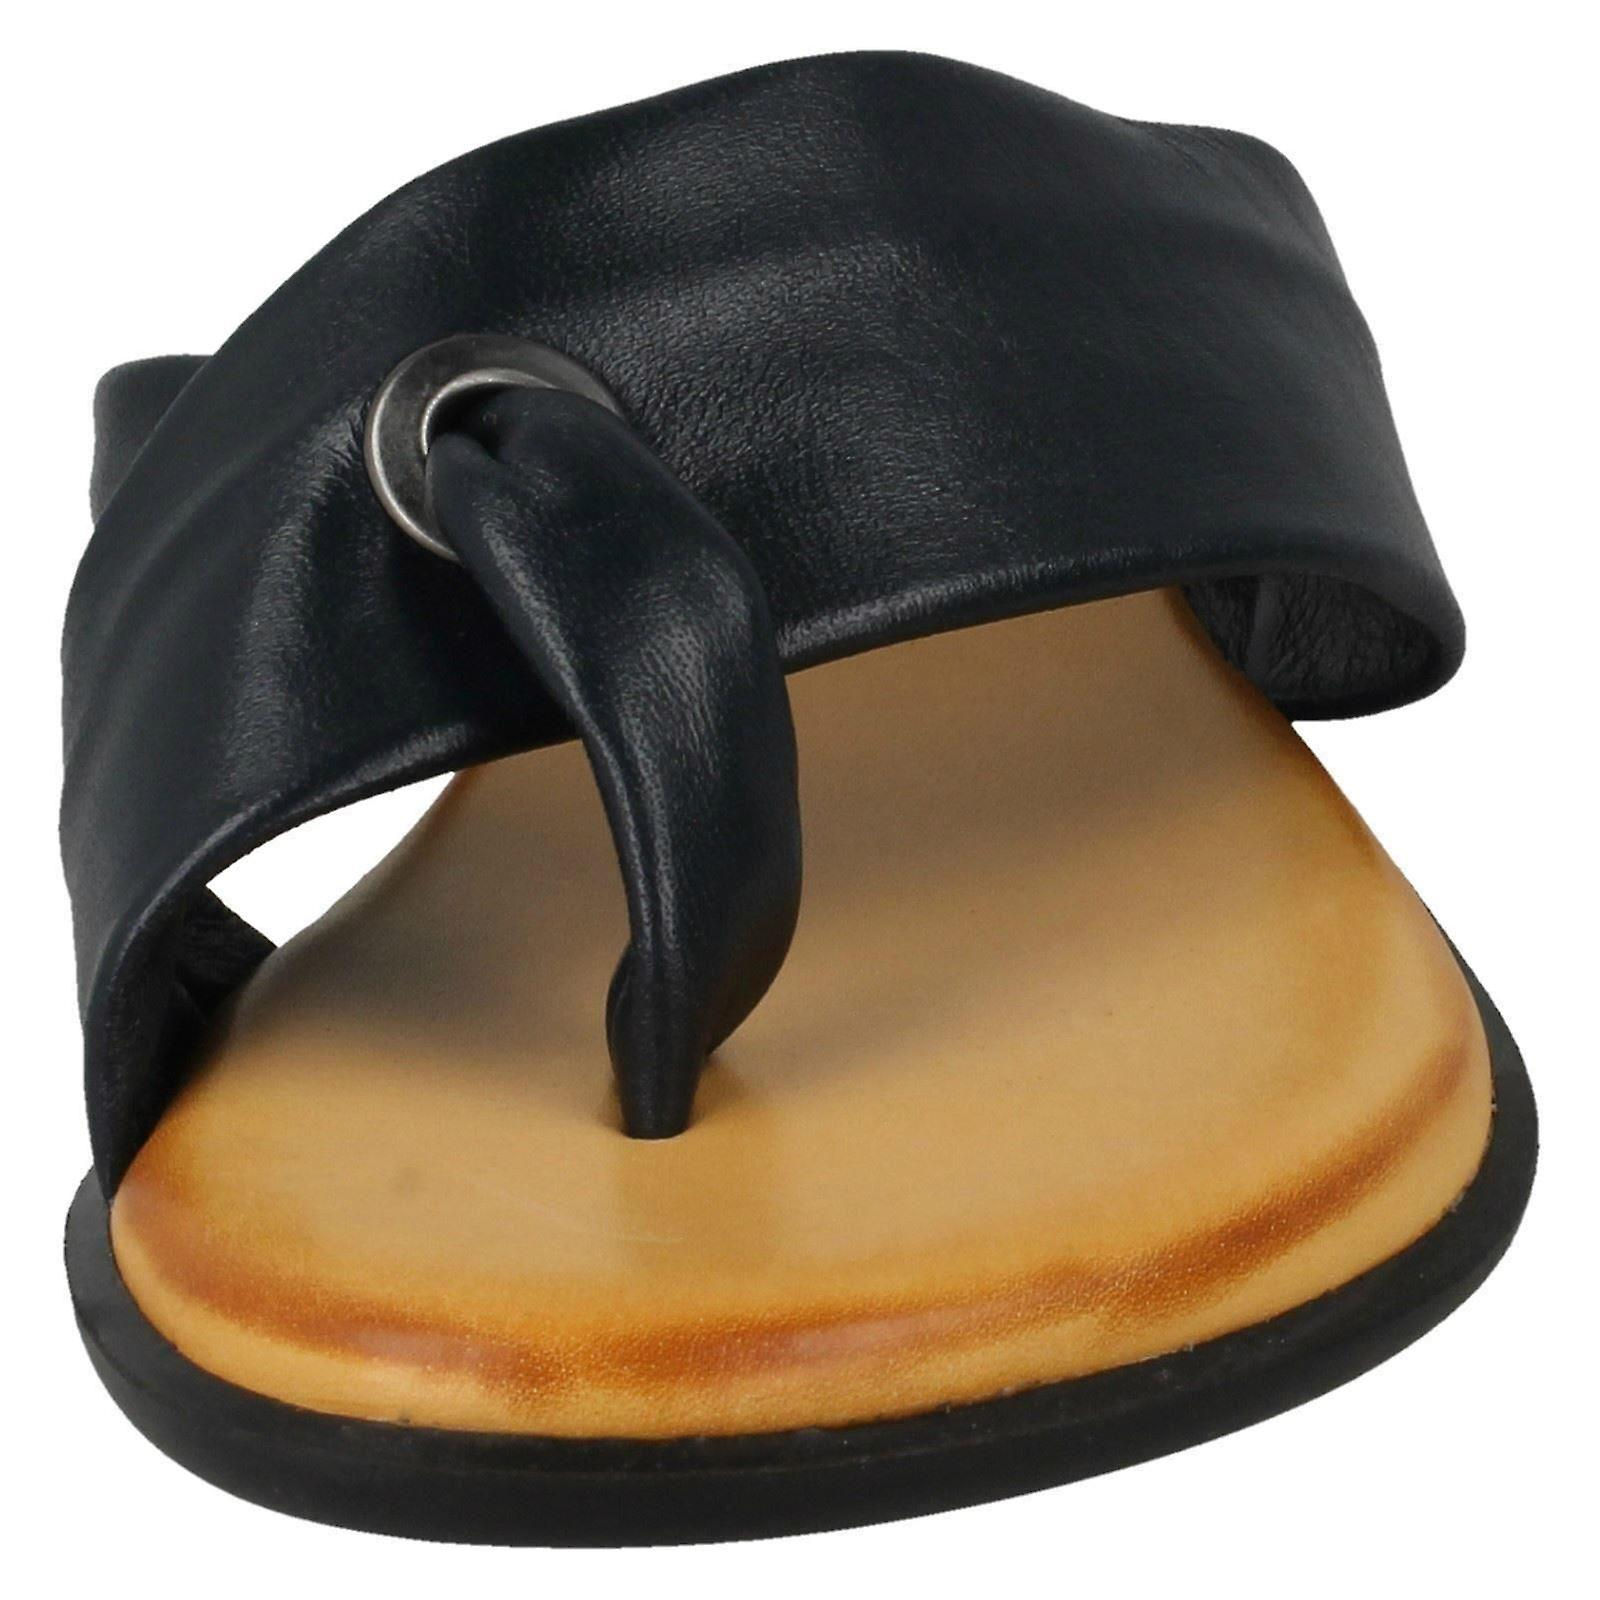 Ladies Leather Collection Toepost Sandals 9BIR7R